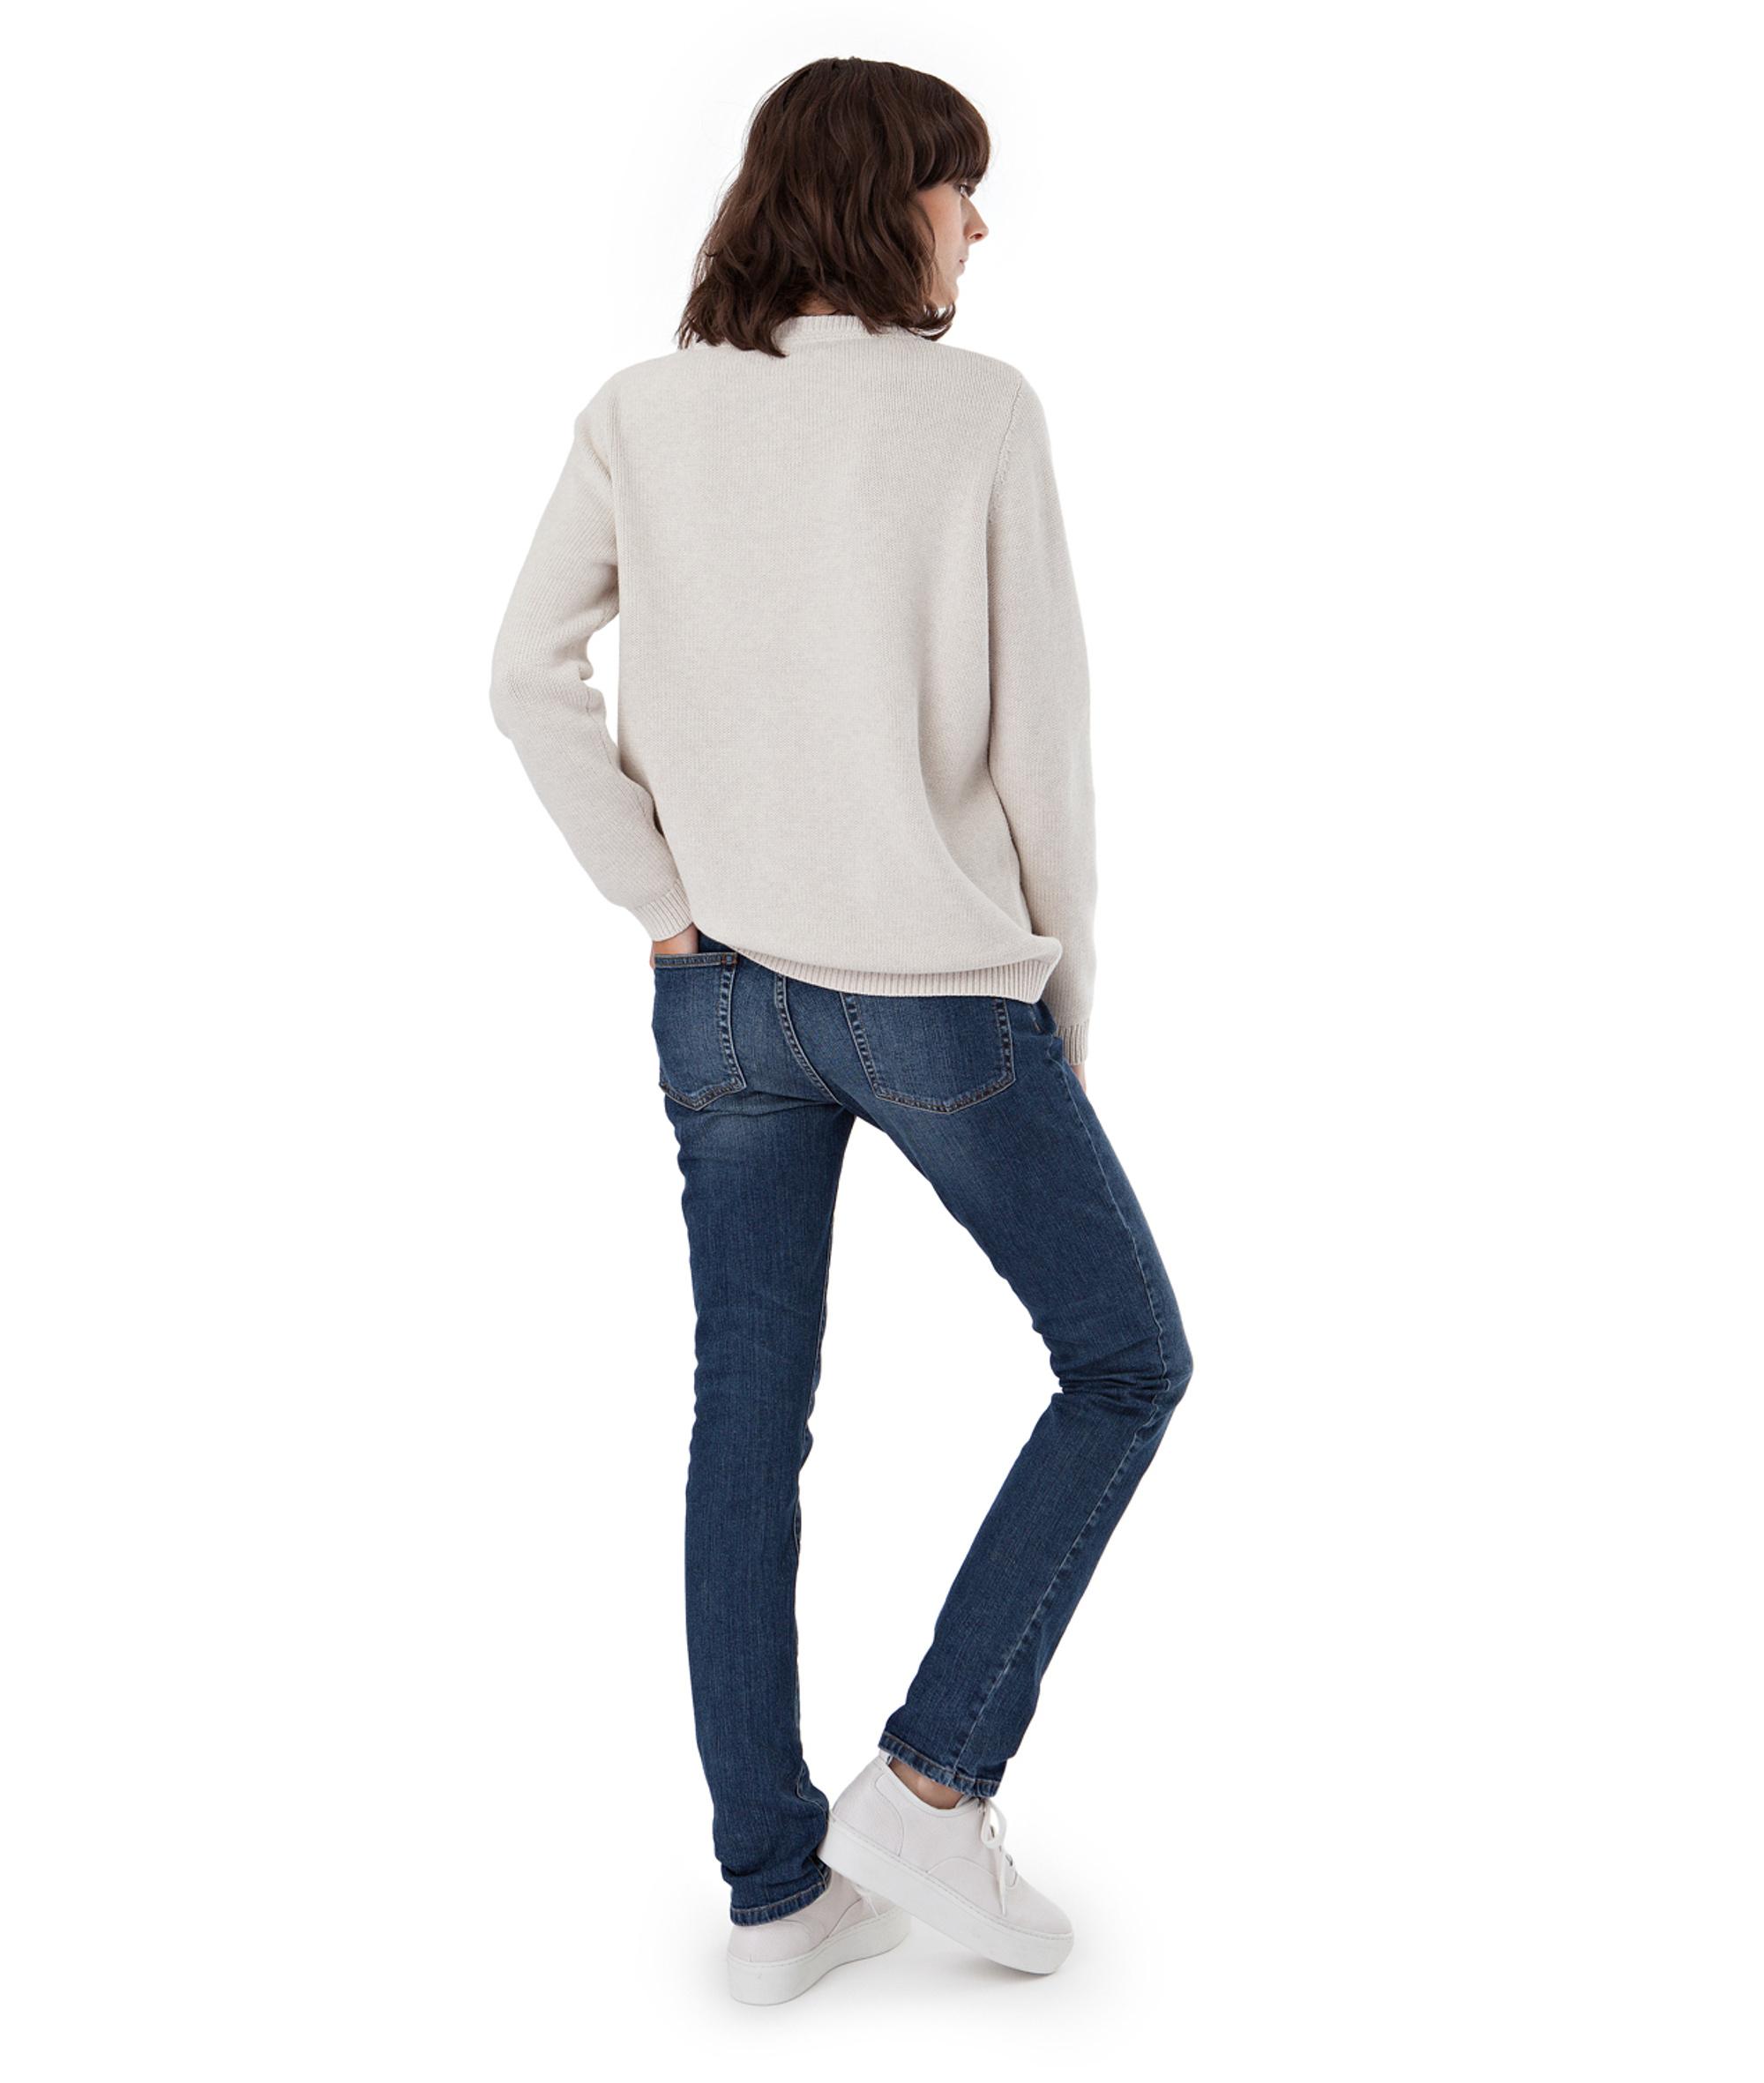 Lova Sweater